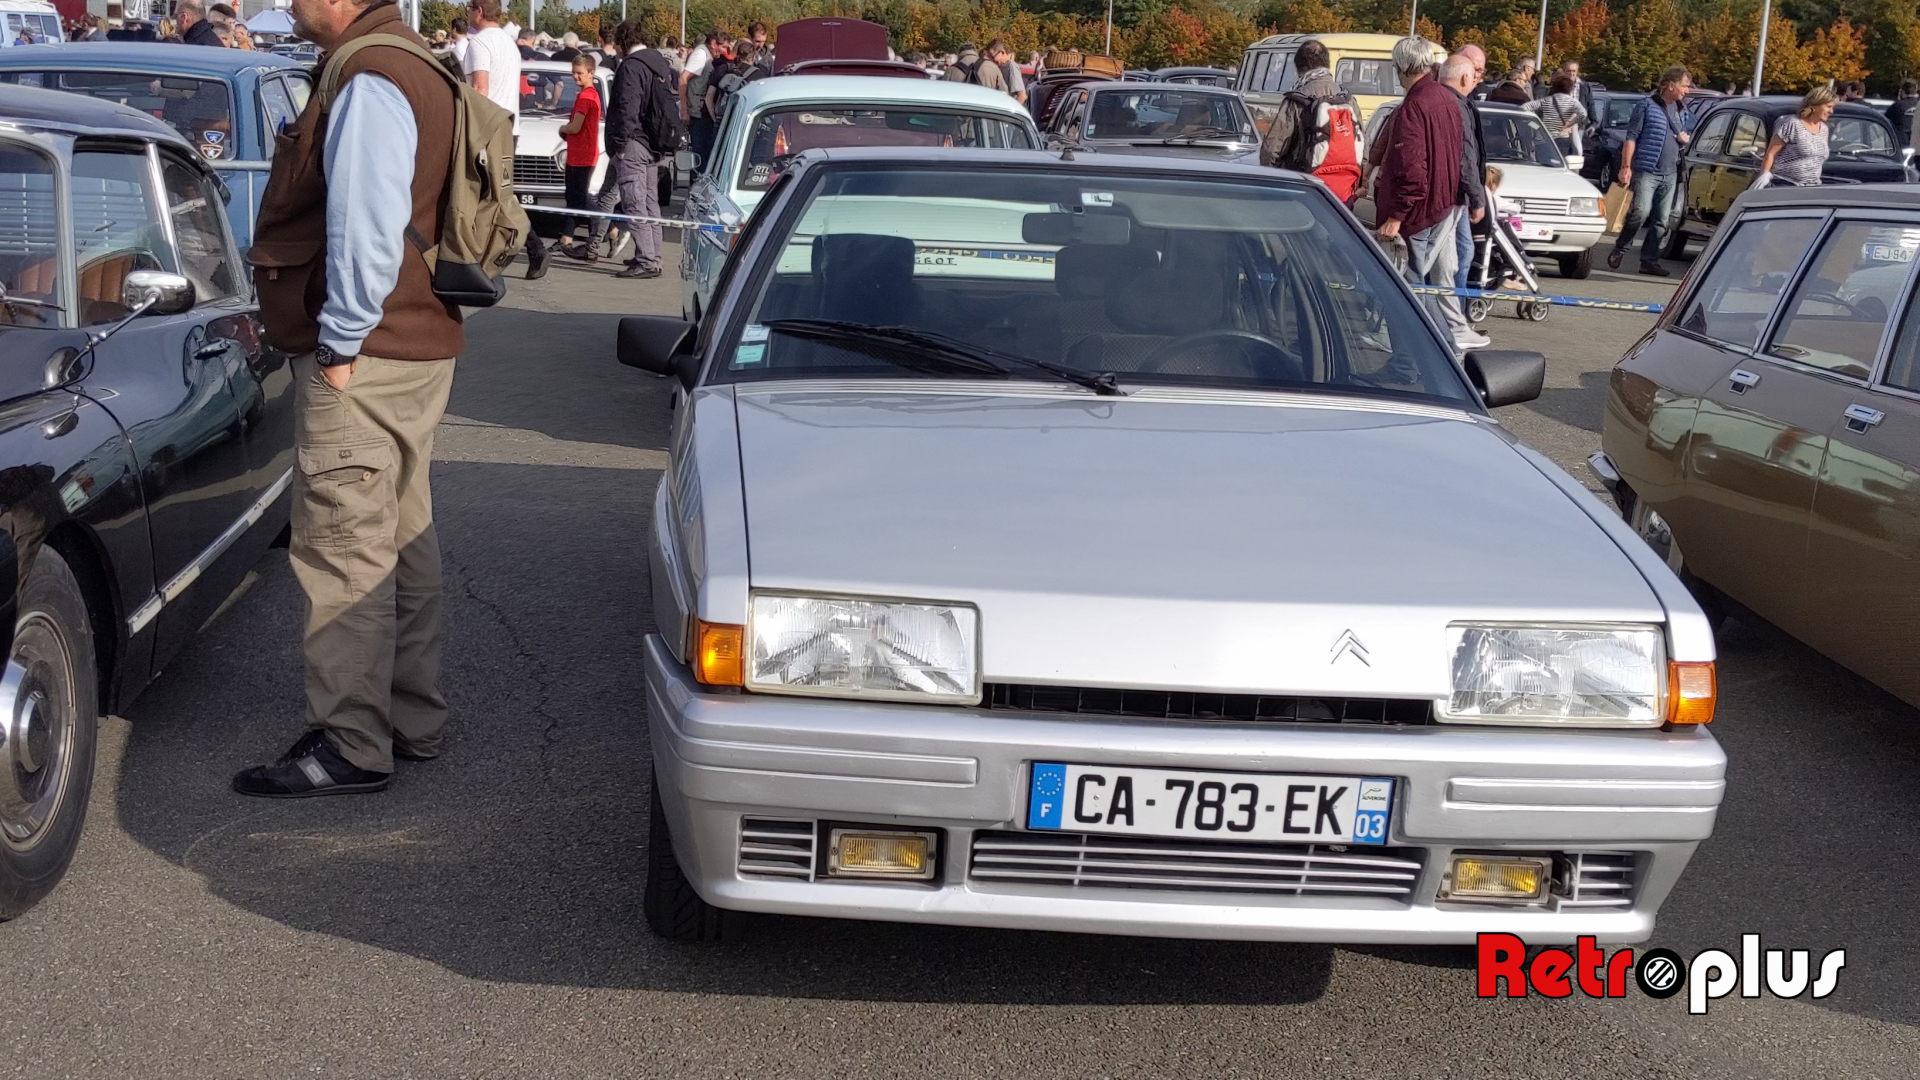 Automedon2019-parkingCitroen35